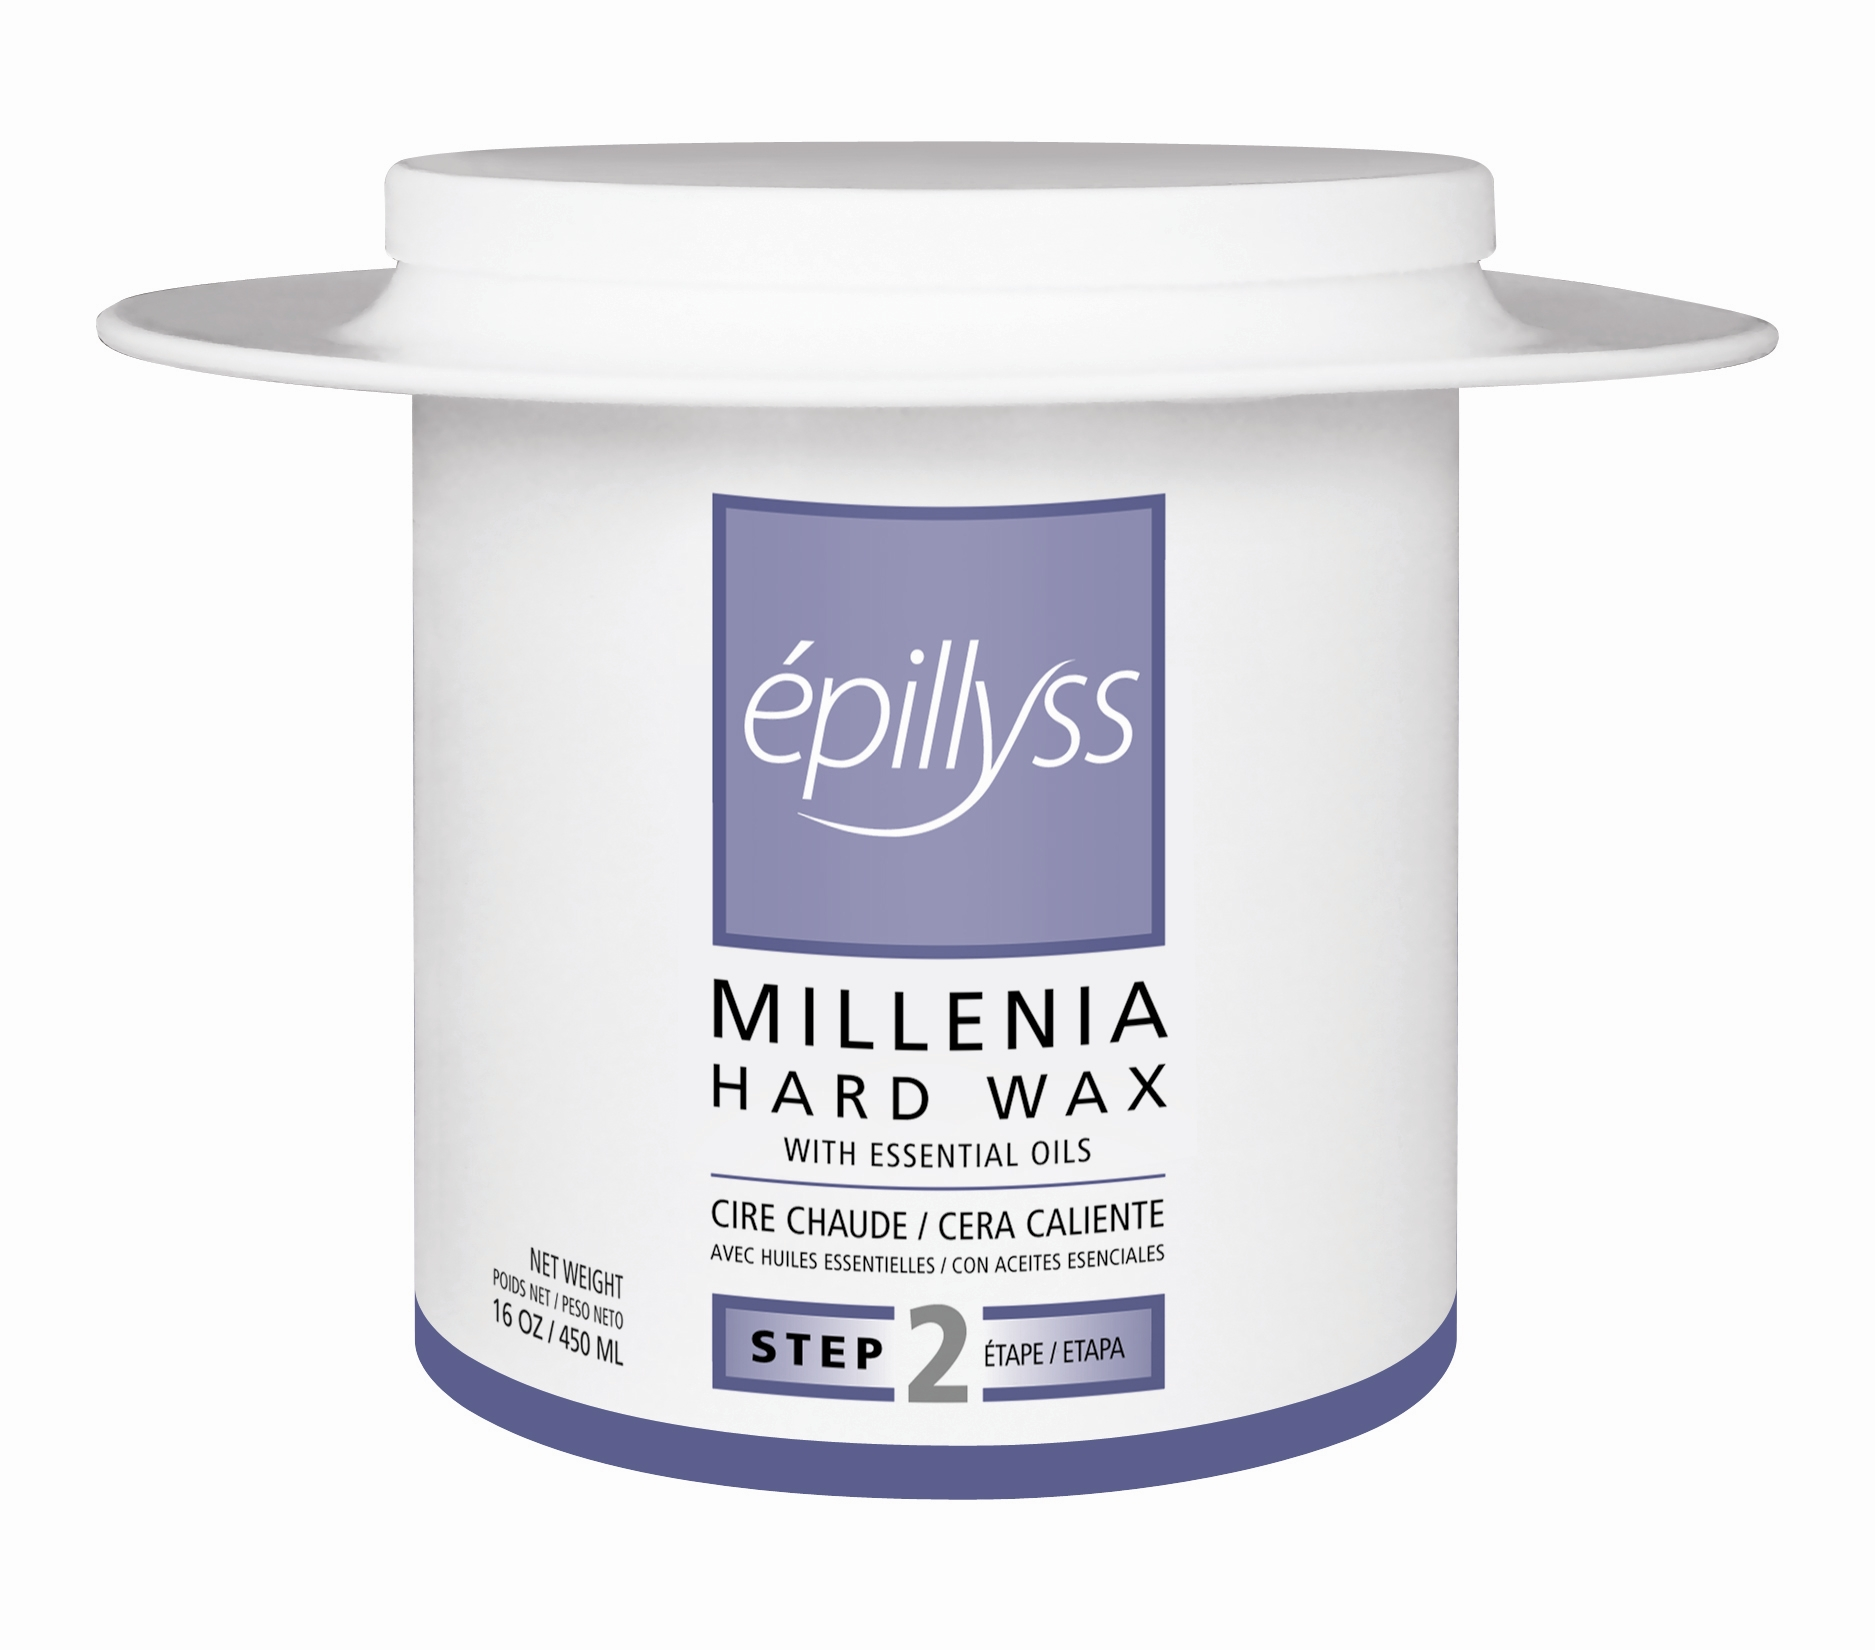 Epillyss HardWax16oz Millenia S2.jpg